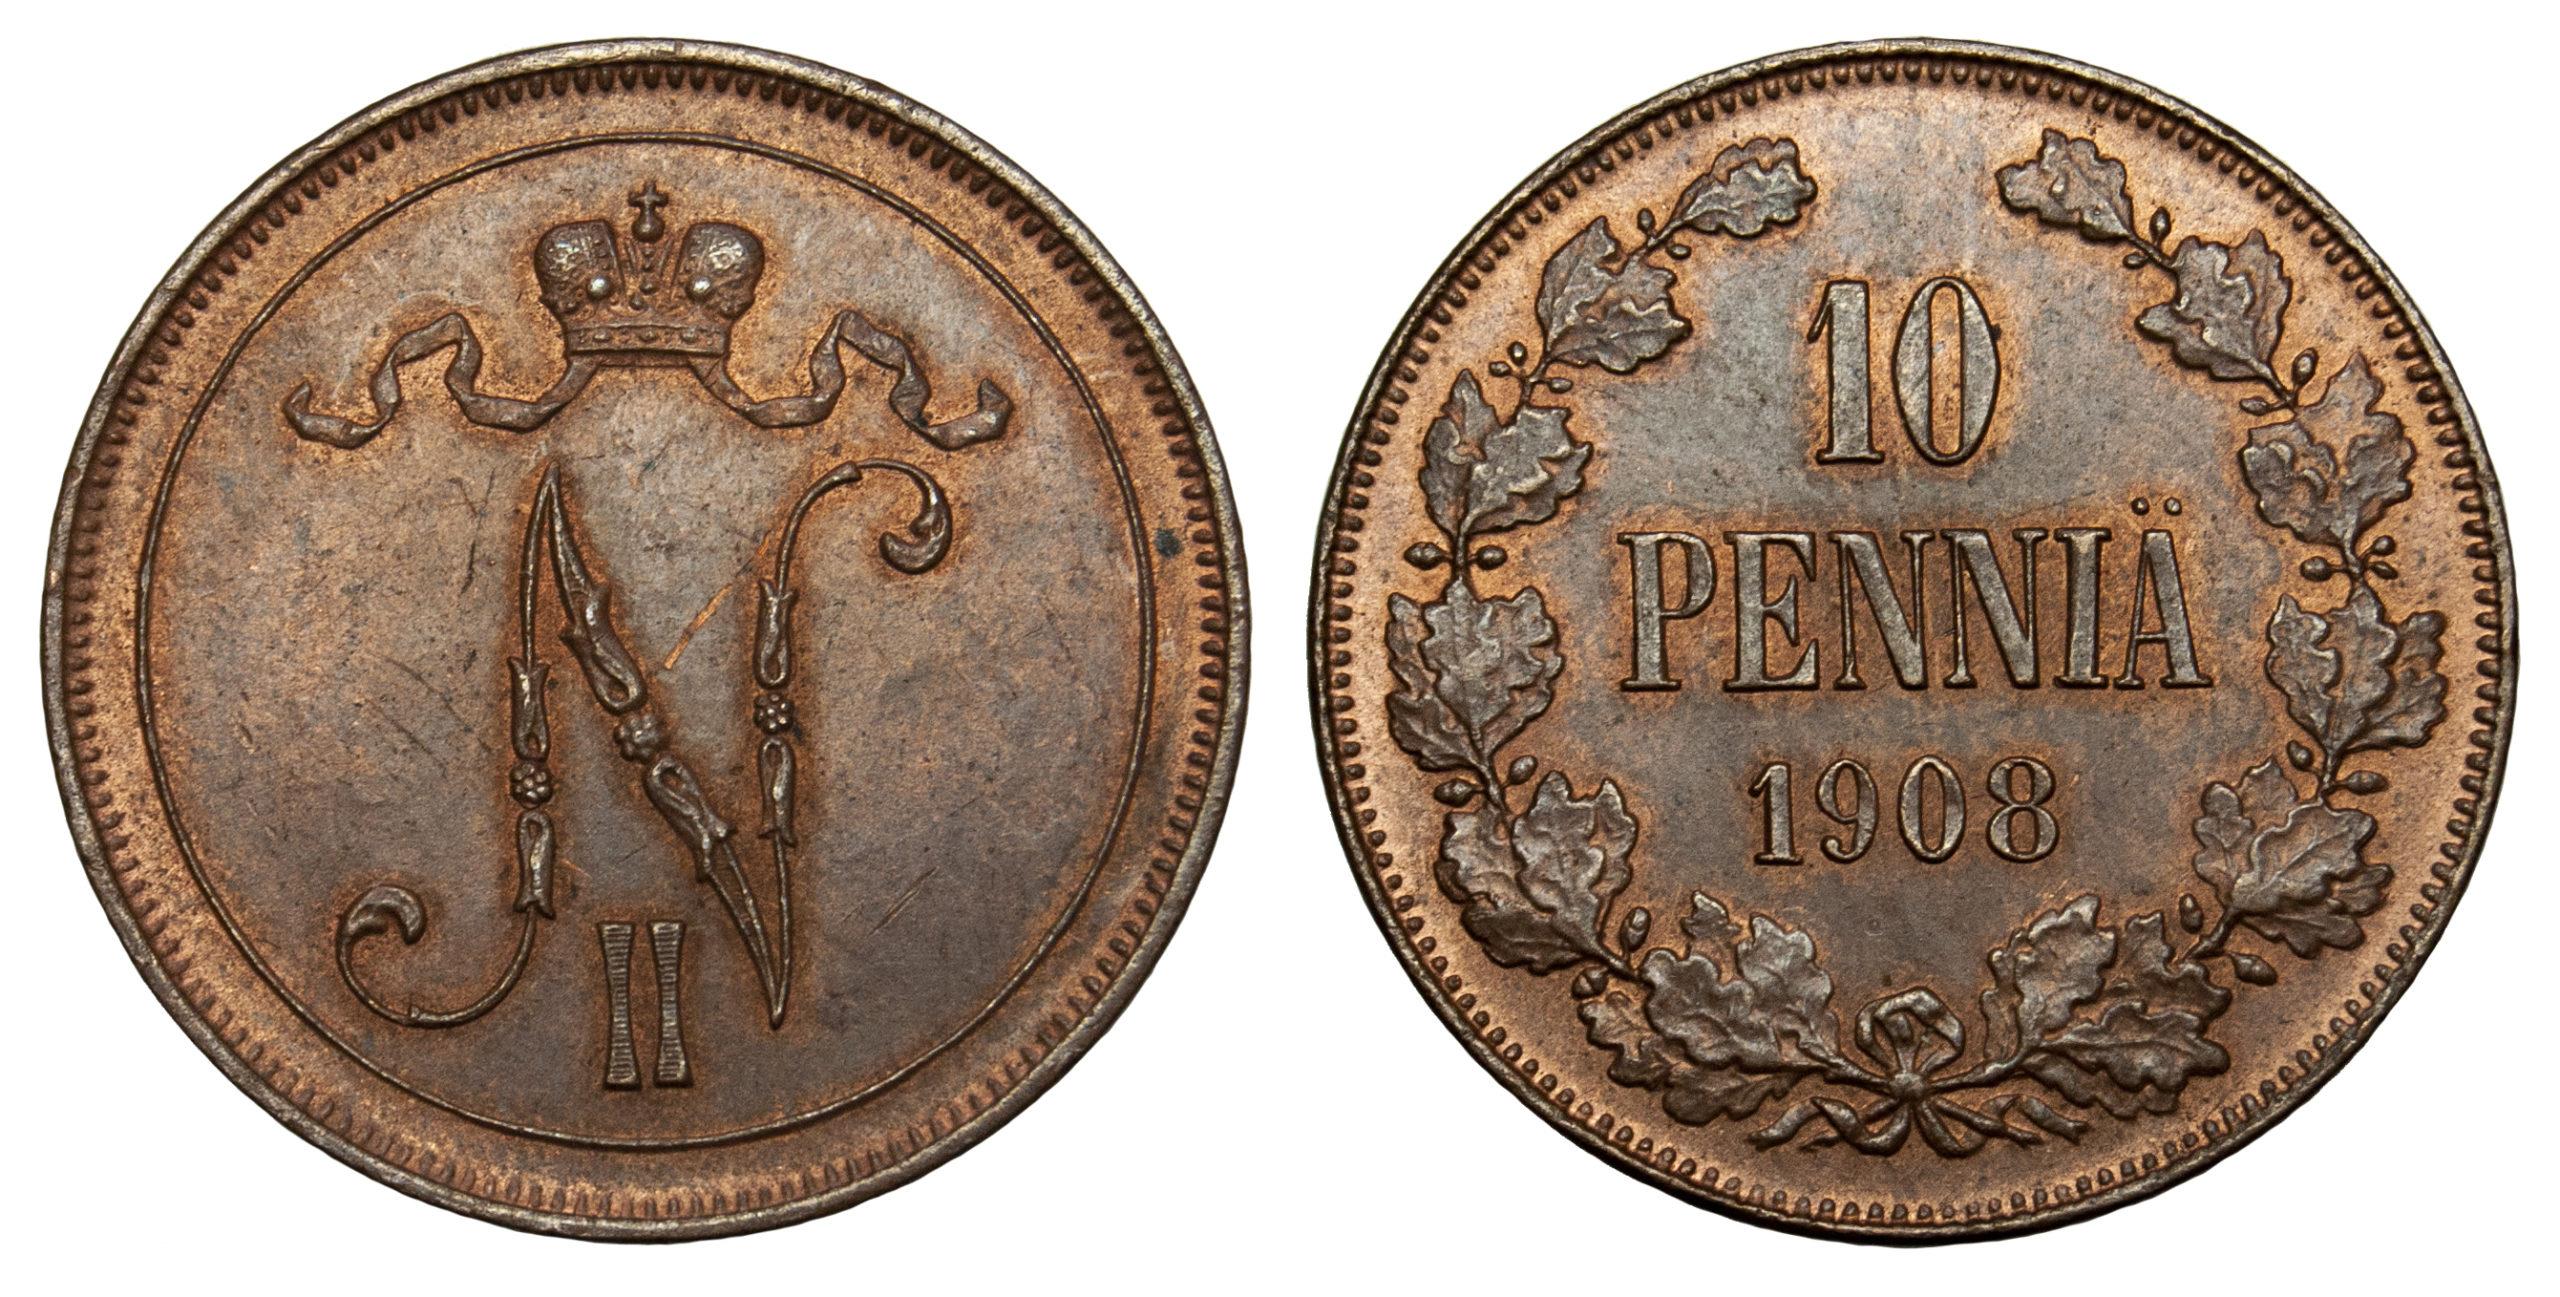 Finland, Nicholas II of Russia, copper 10 Pennia, 1908